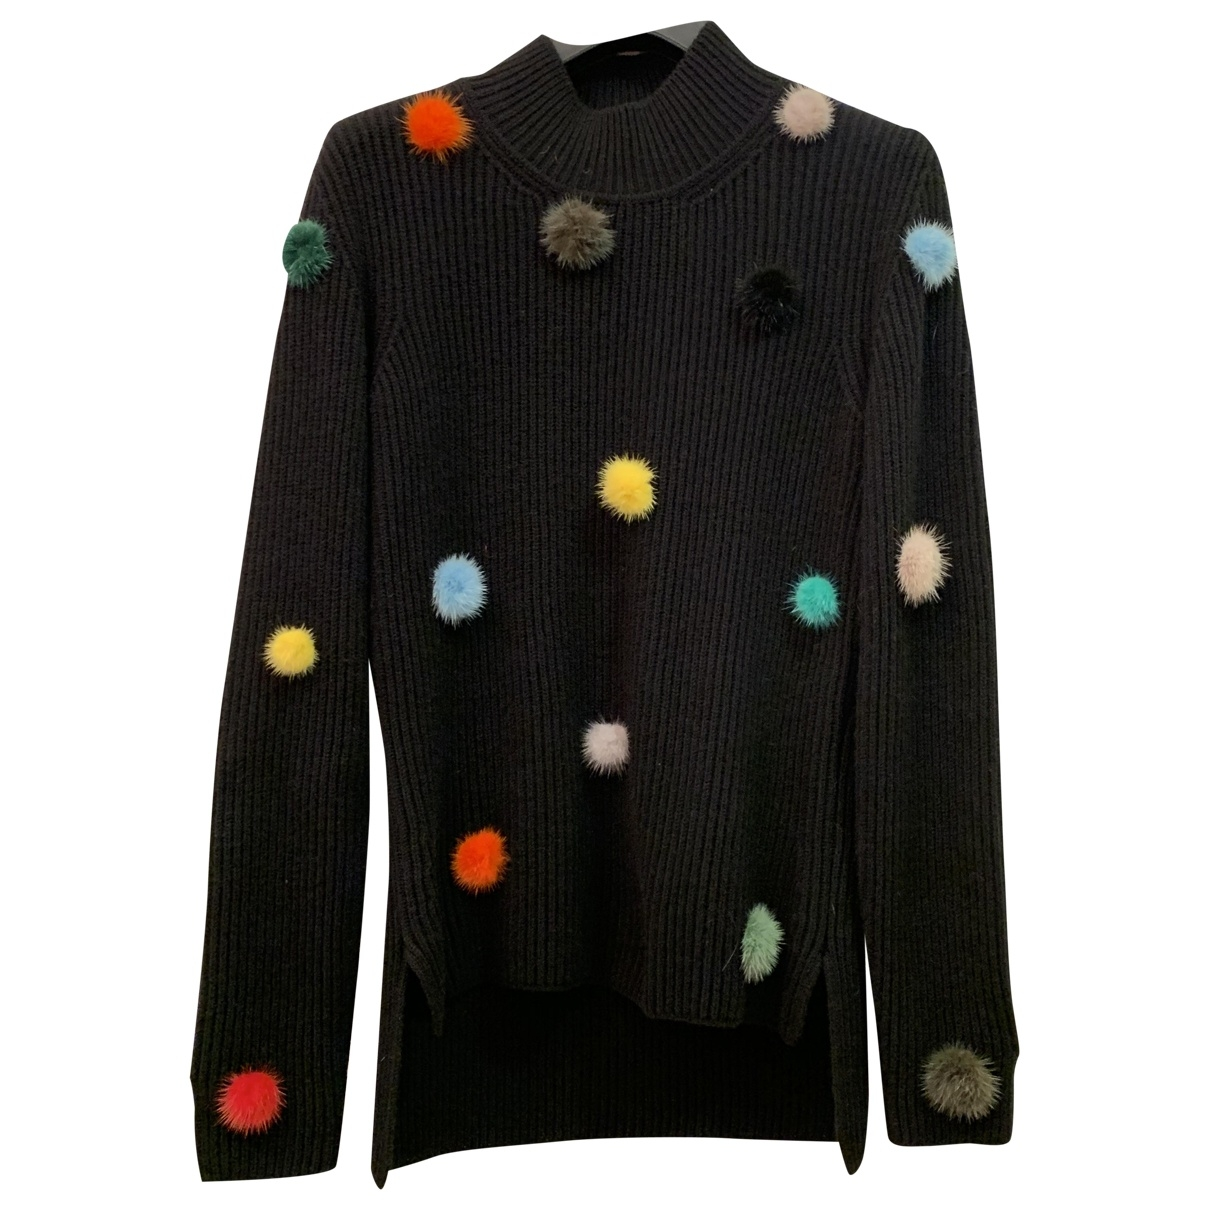 Fendi \N Pullover in  Schwarz Kaschmir